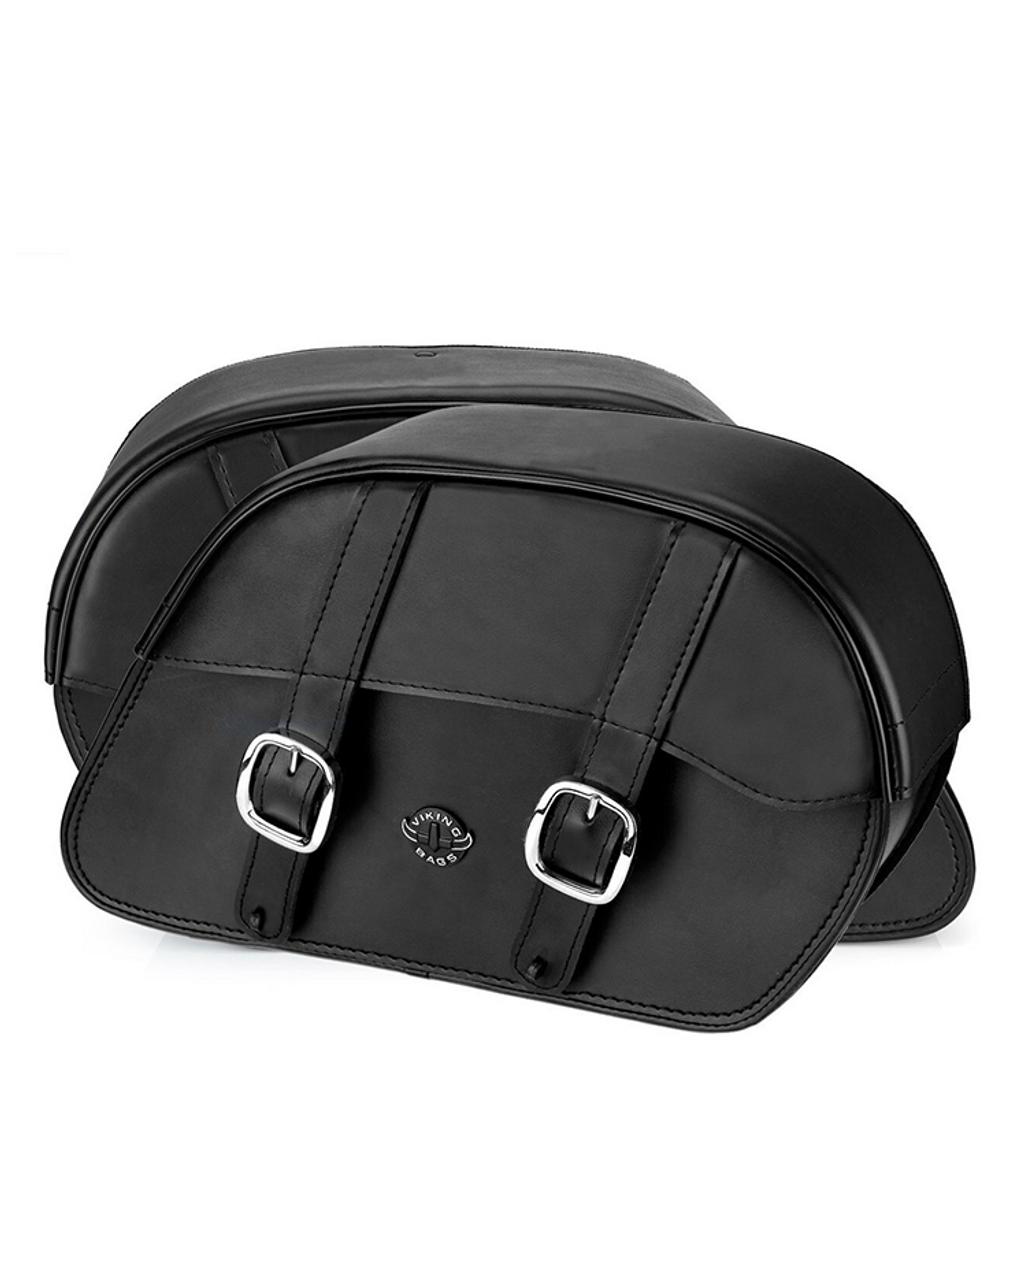 Viking Medium Slanted Motorcycle Saddlebags For Harley Softail Custom FXSTC Both Bags View